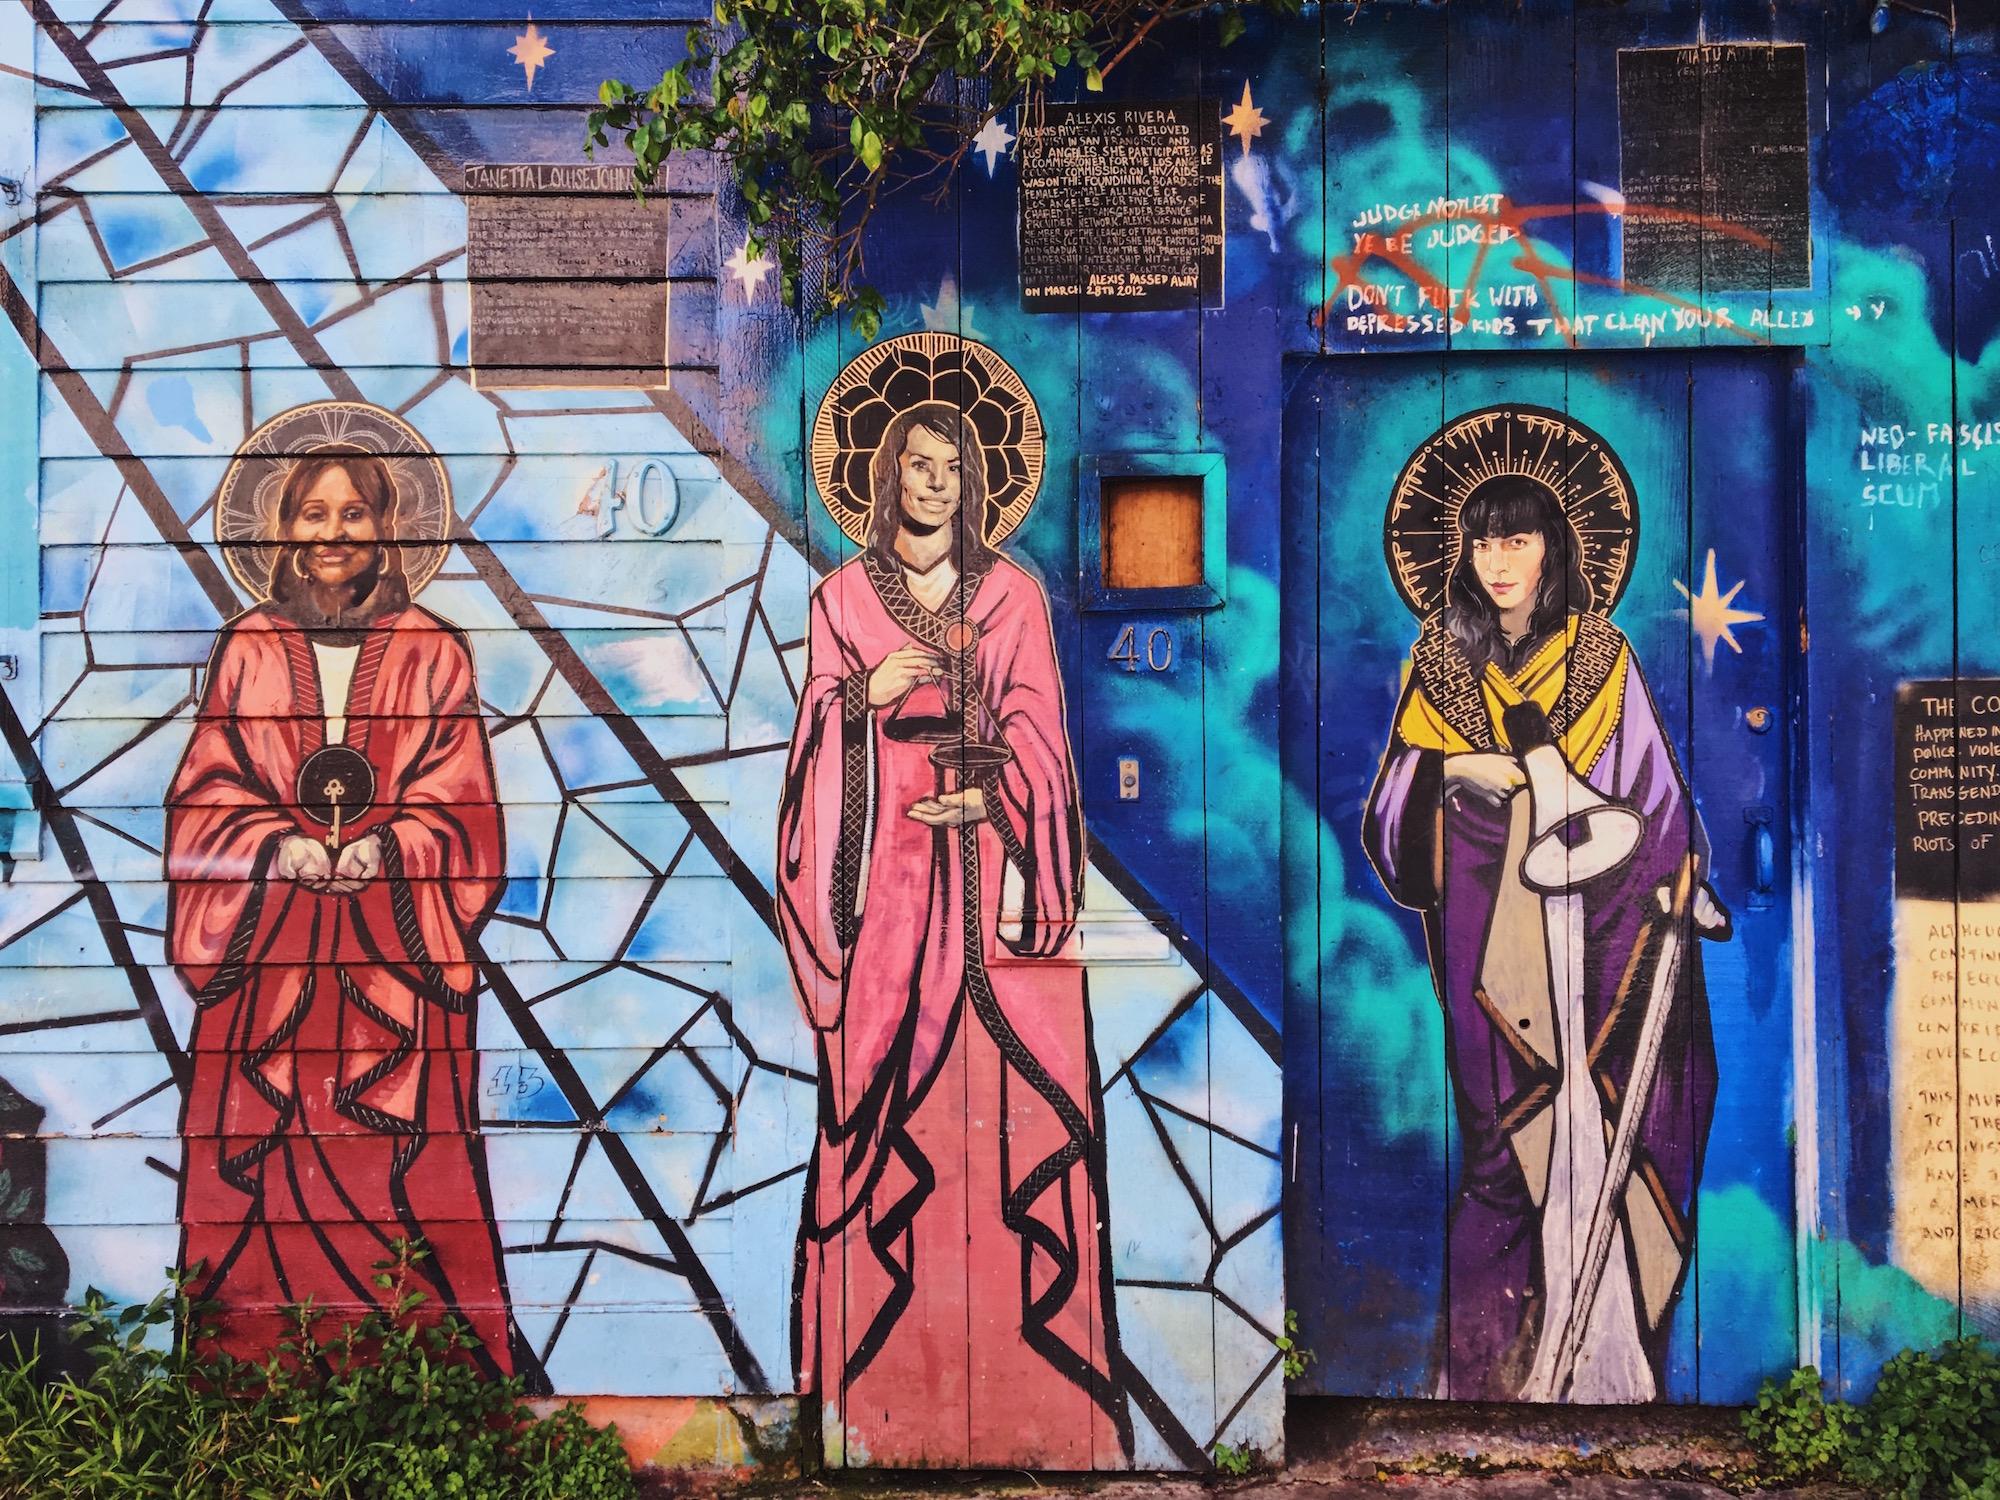 Clarion Alley - Murales nel quartiere Mission di San Francisco - Honoring Trans Activists (2012) - Tanya Wischerath